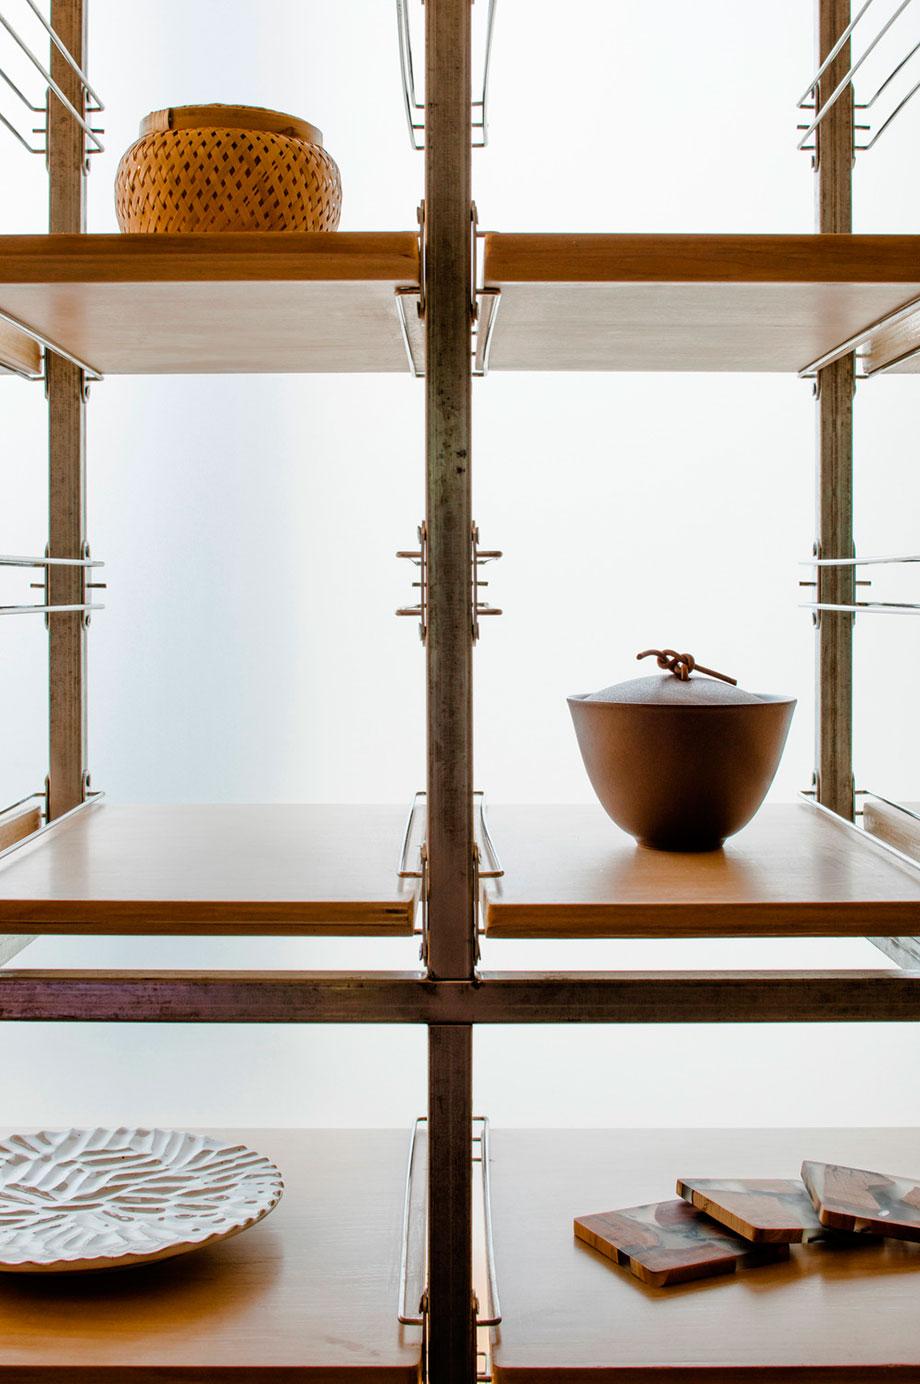 the zentral kitchen de lukstudio (14) - foto peter dixie